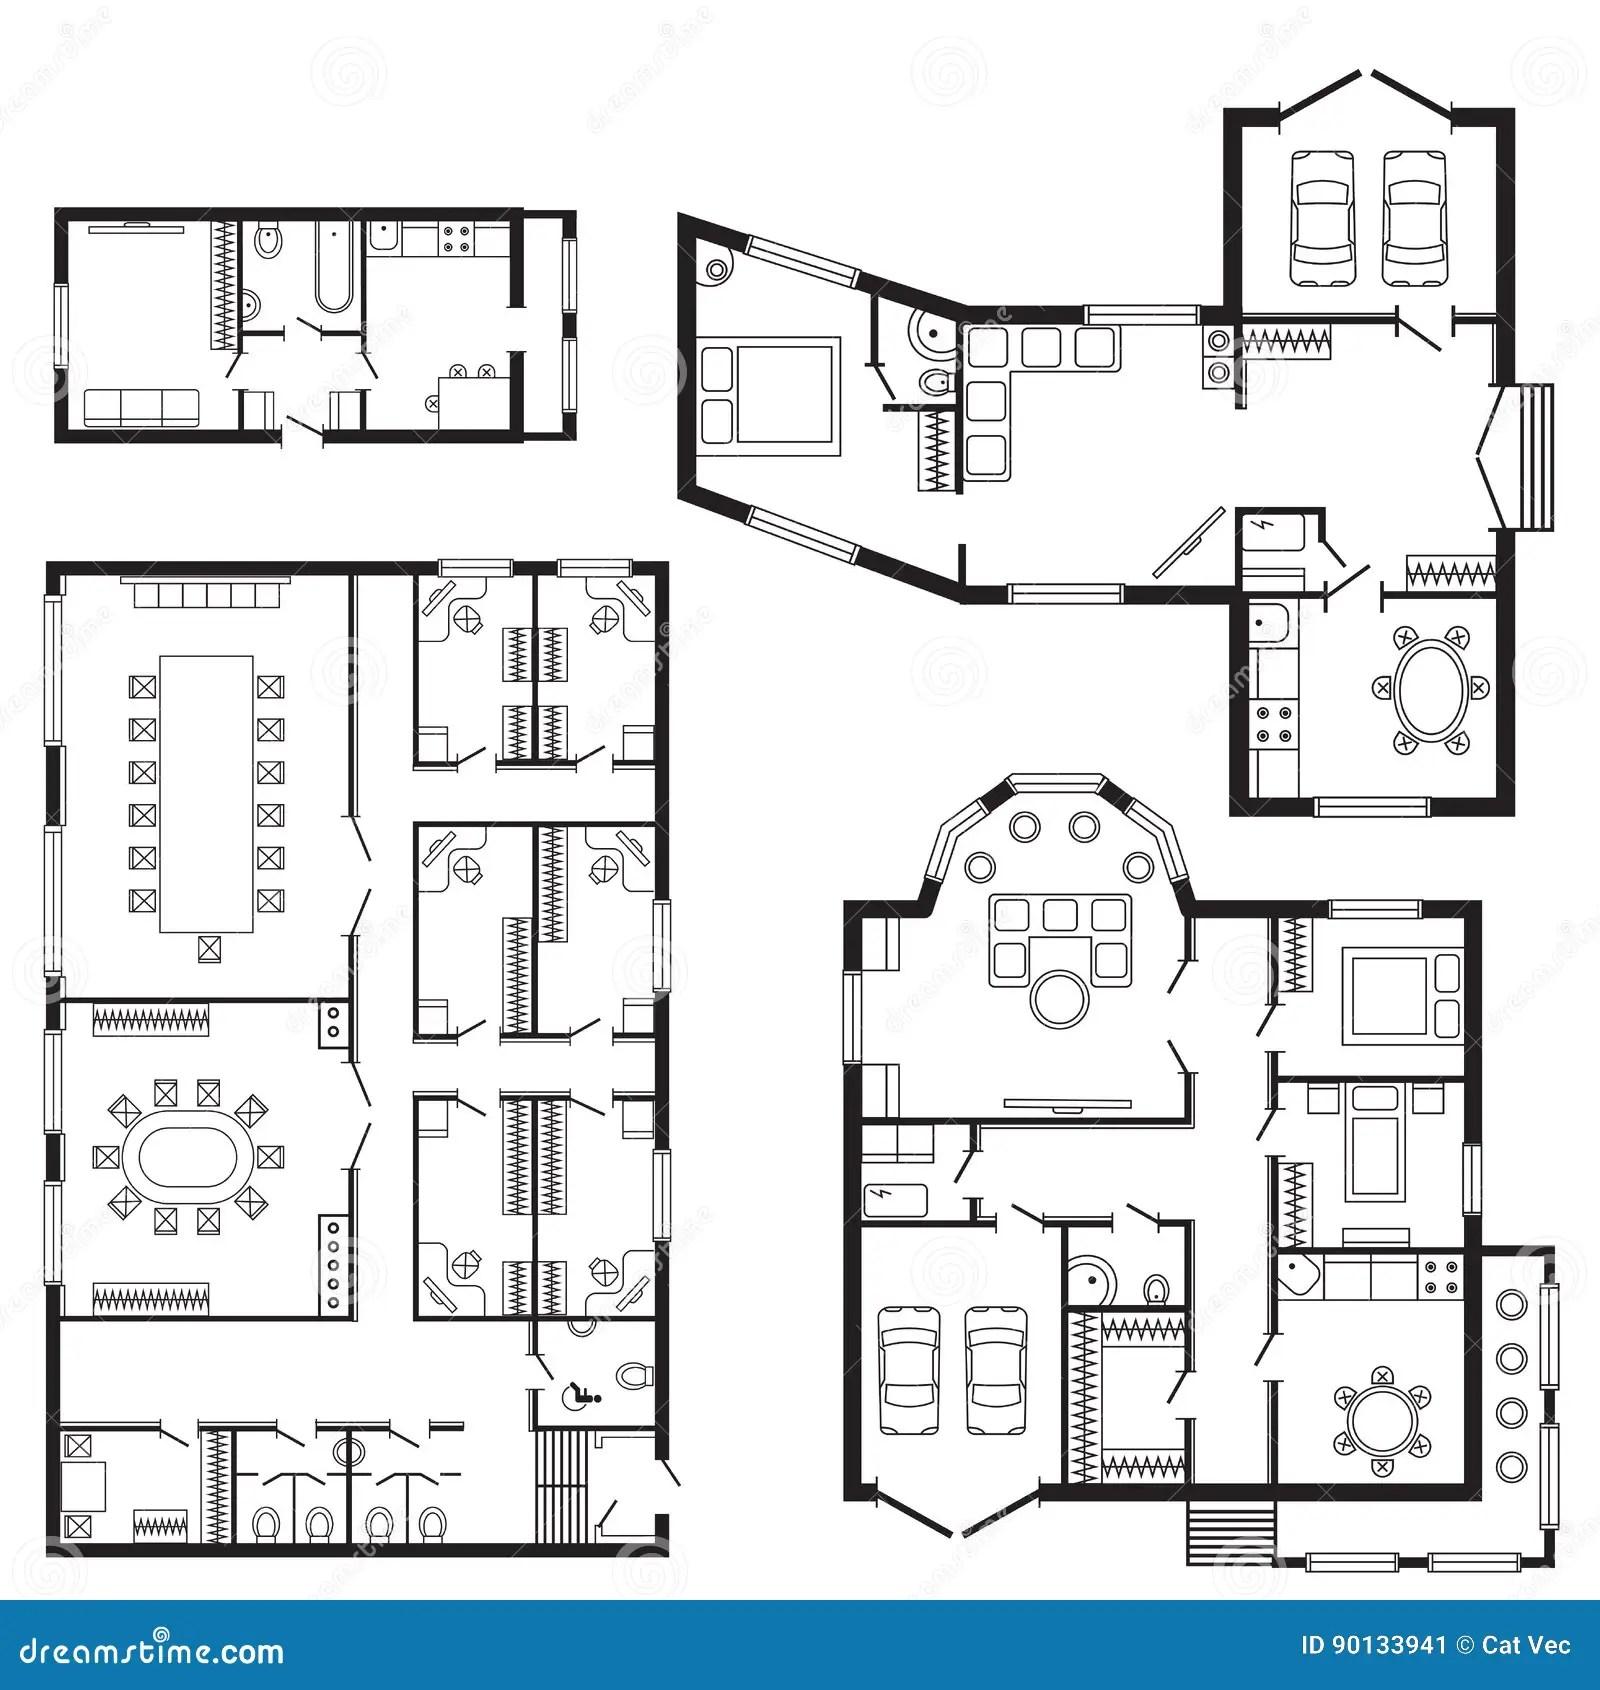 Project Architect Diagram